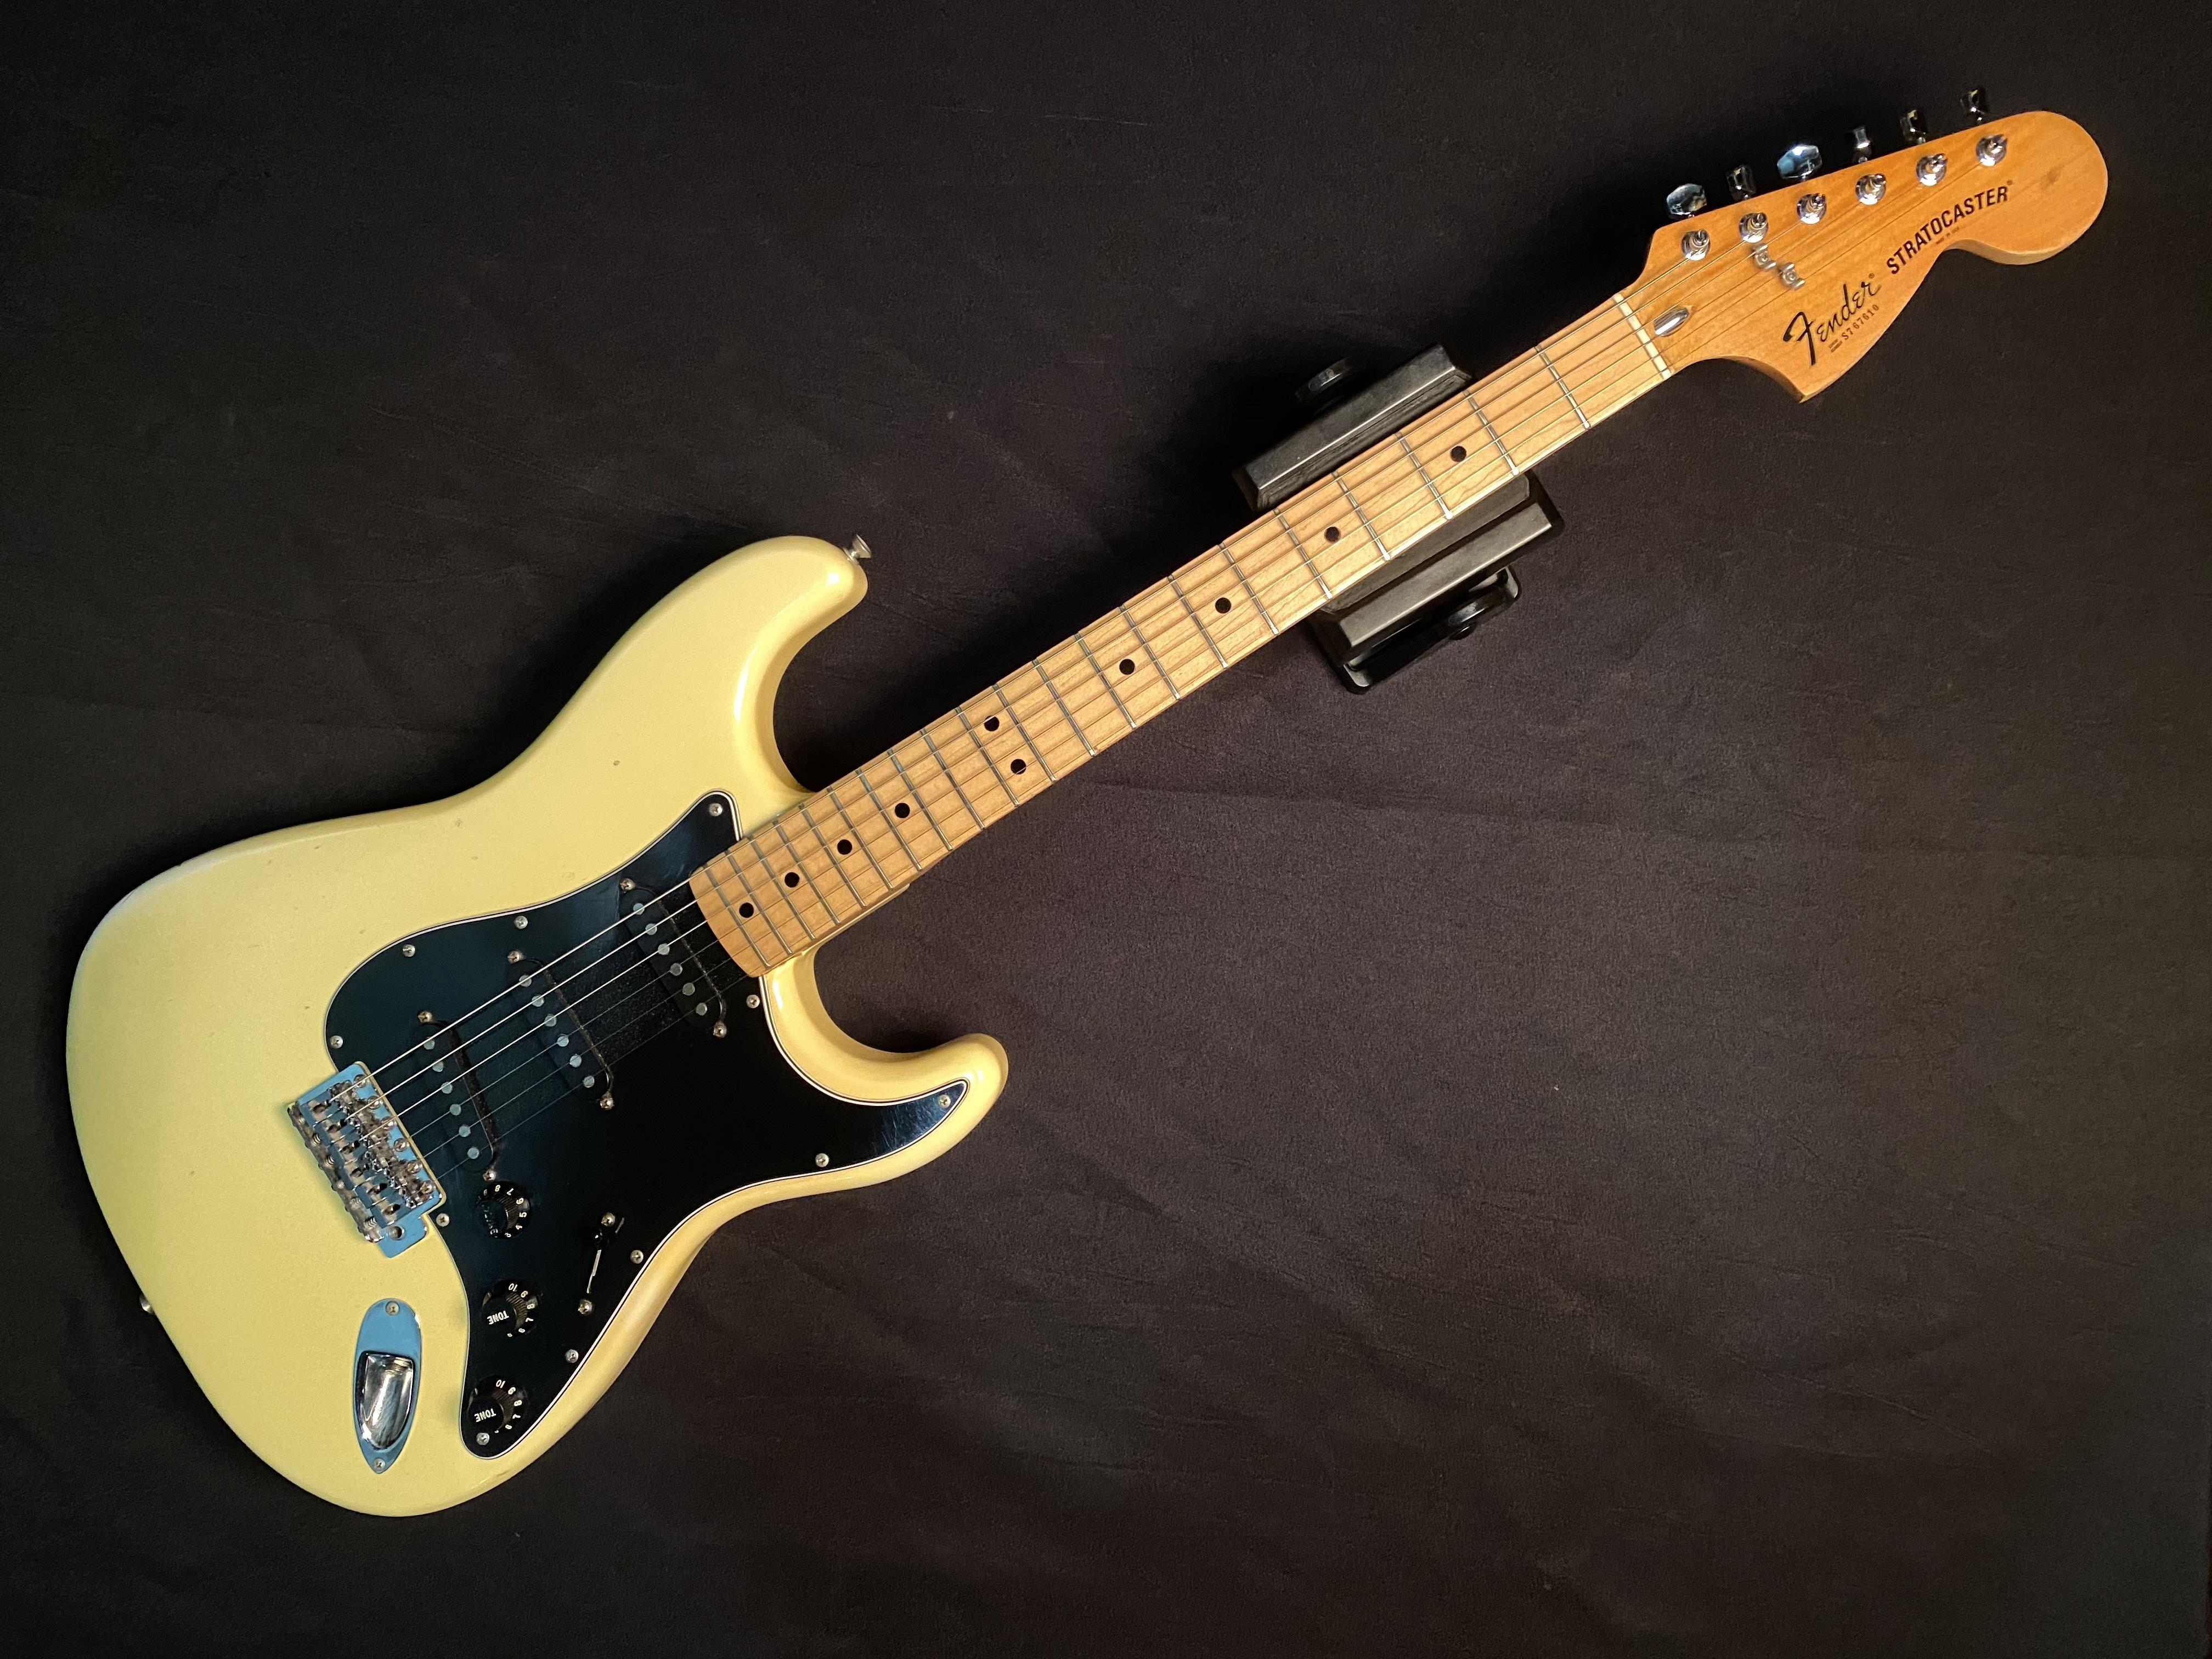 1977 FENDER - STRATOCASTER - ELECTRIC GUITAR